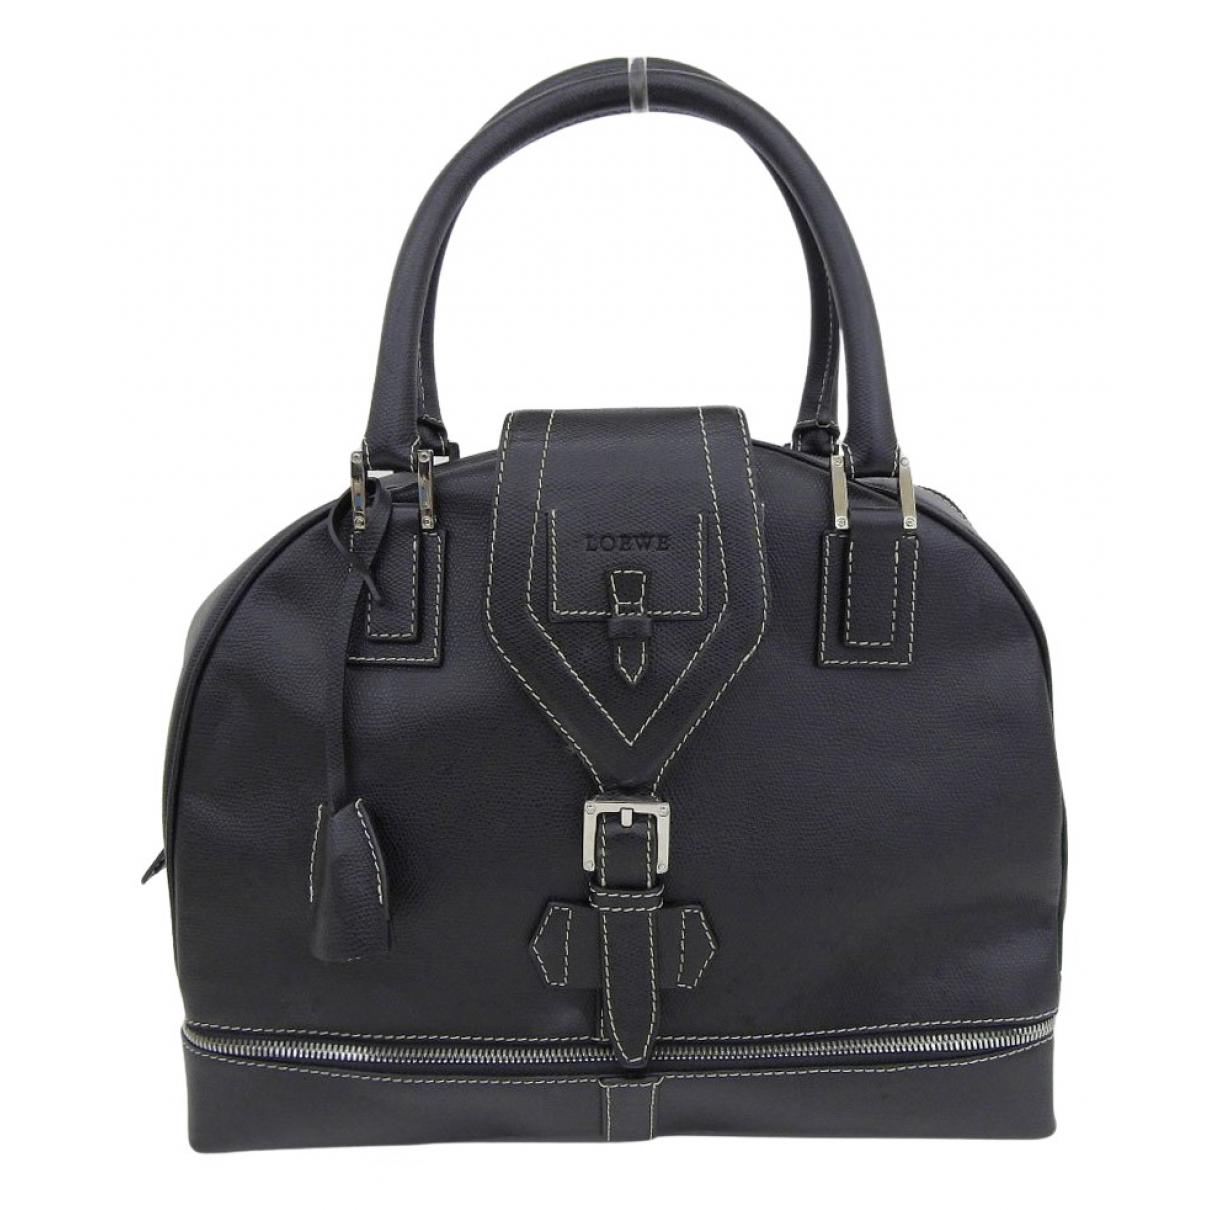 Loewe \N Handtasche in  Schwarz Leder